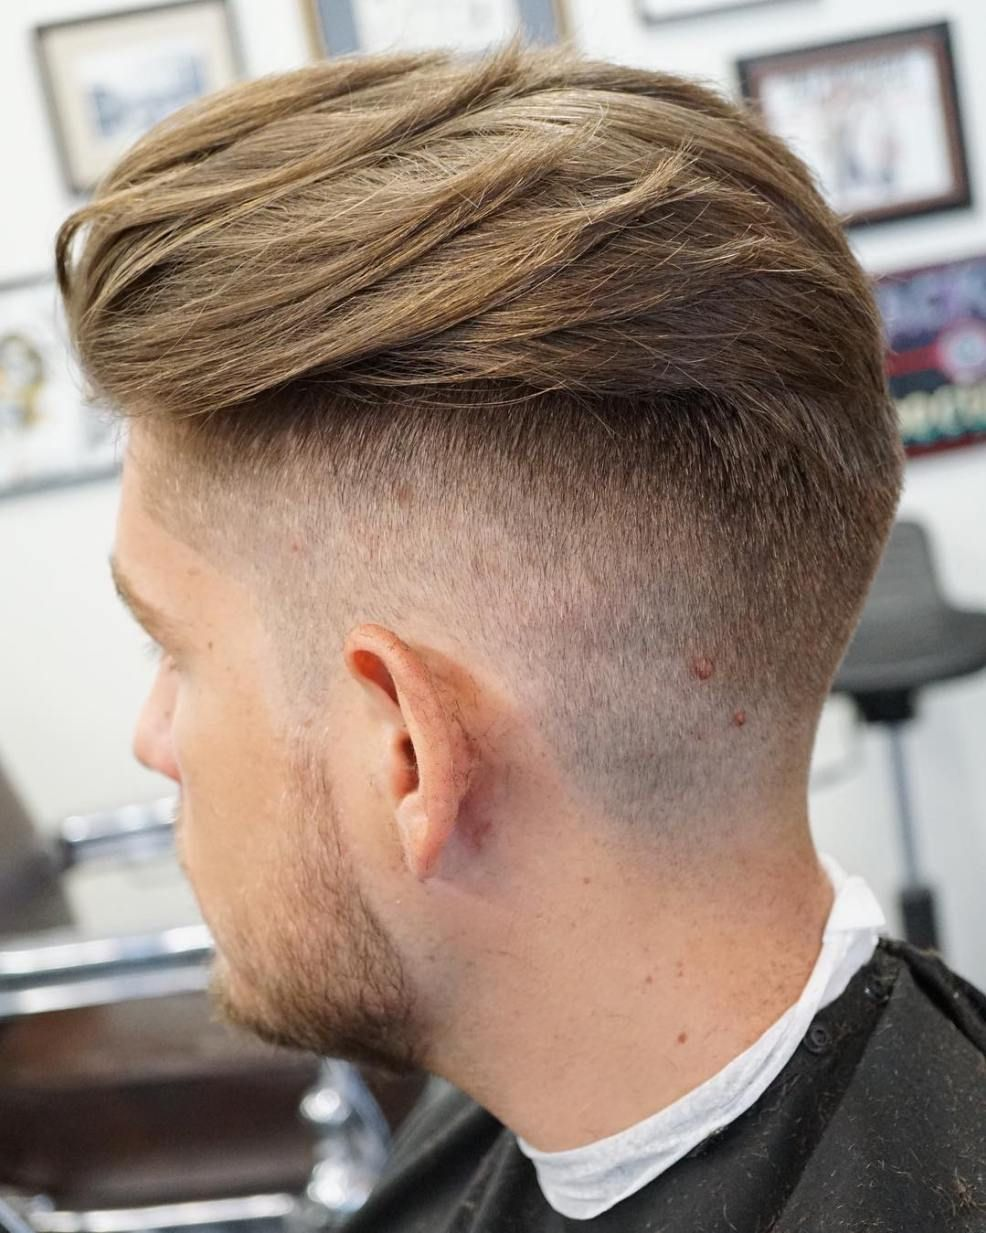 Haircut ideas men  ultracool high fade haircuts for men  high fade haircut high